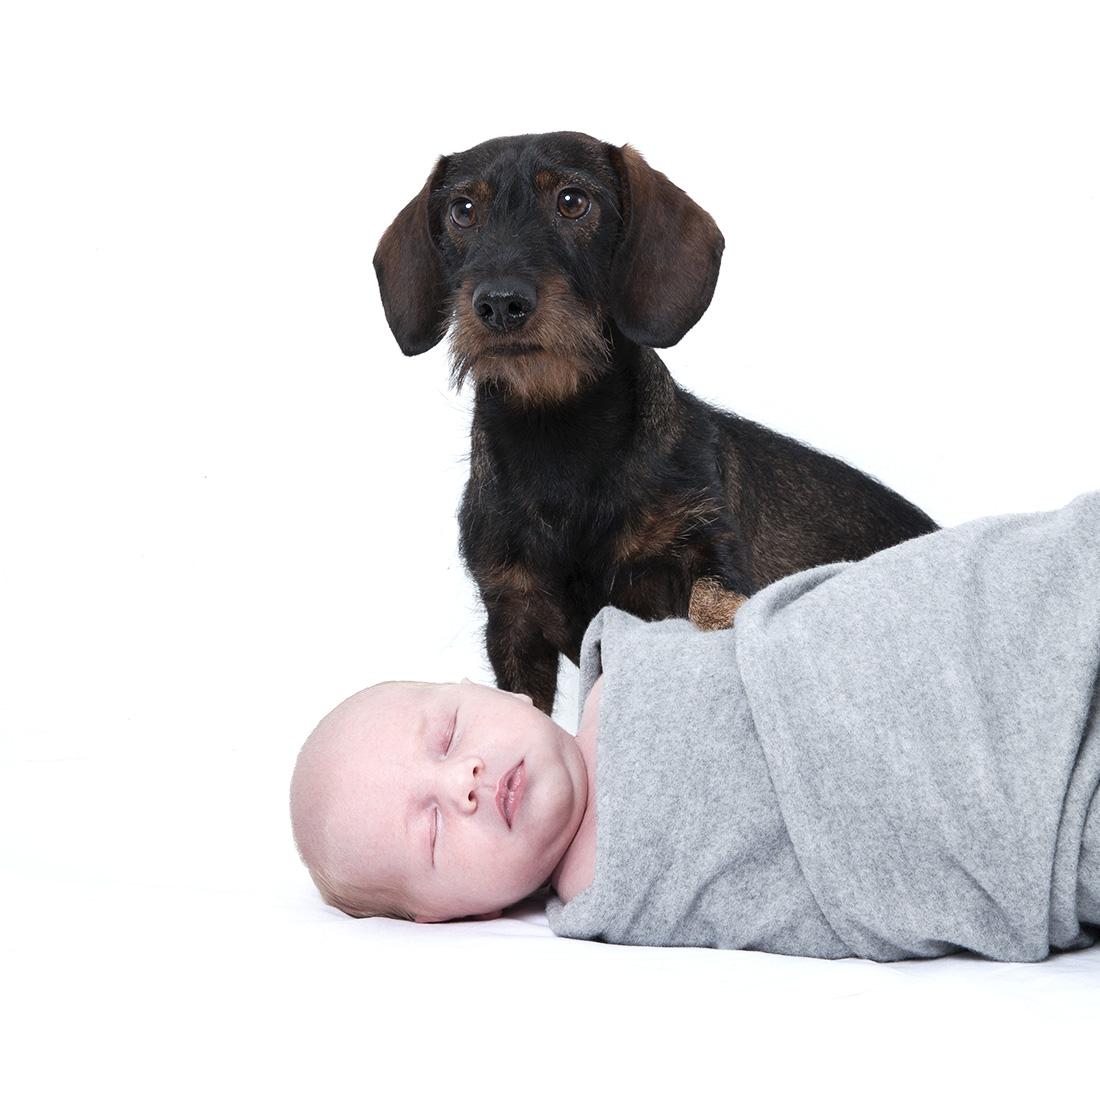 Neugeborenenes_mit_Hund_Babyfotografie_Berlin © Miriam Ellerbrake Berlin